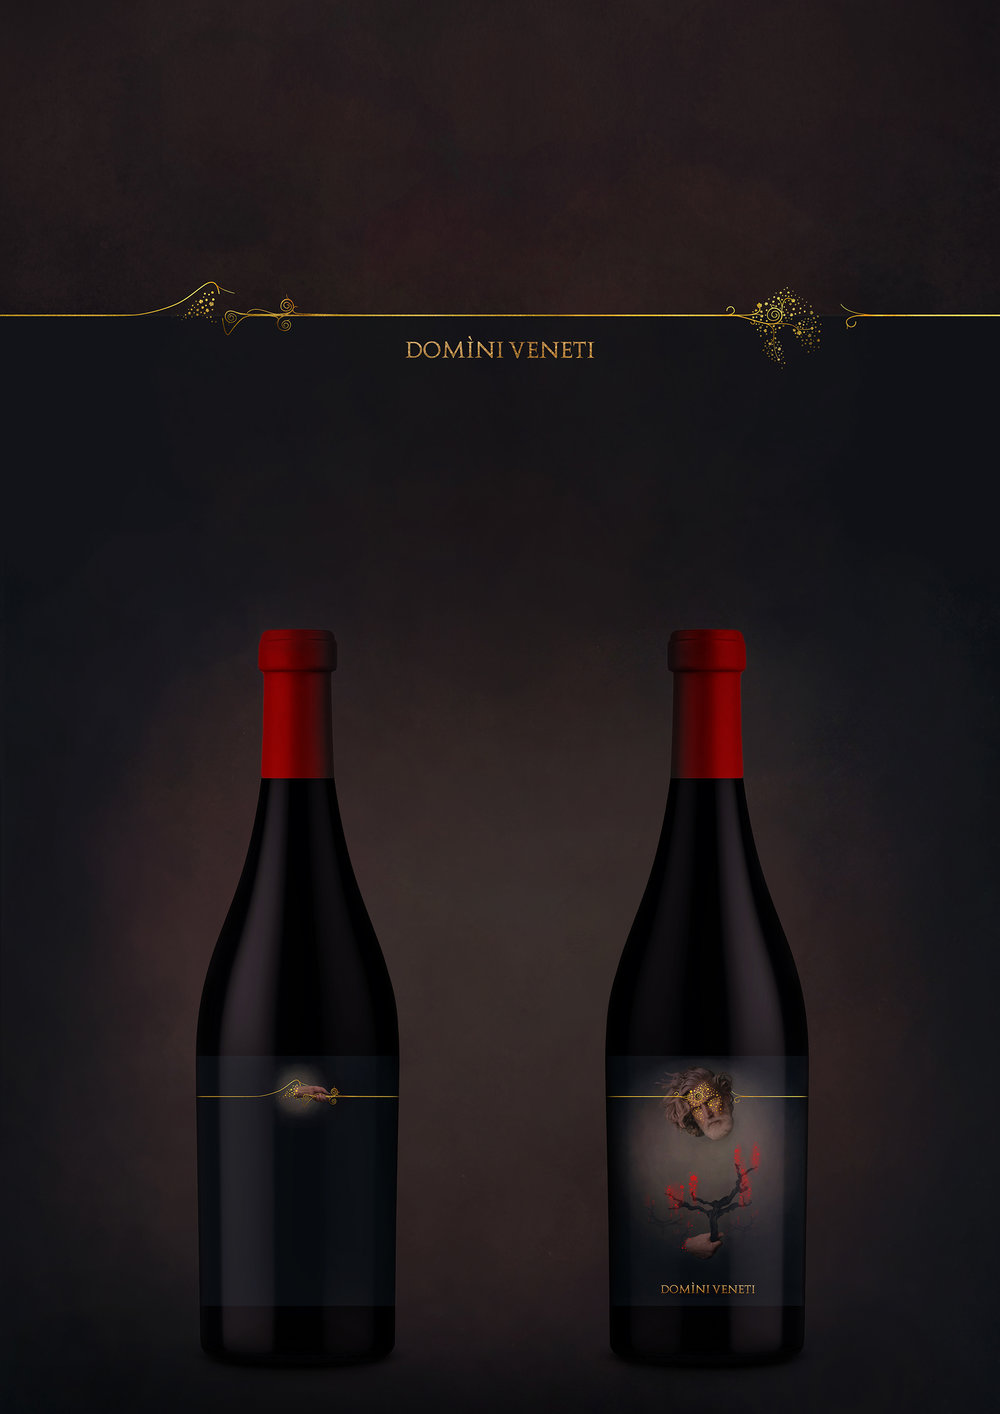 domini veneti_ wine_package_graphic_hazem talaat